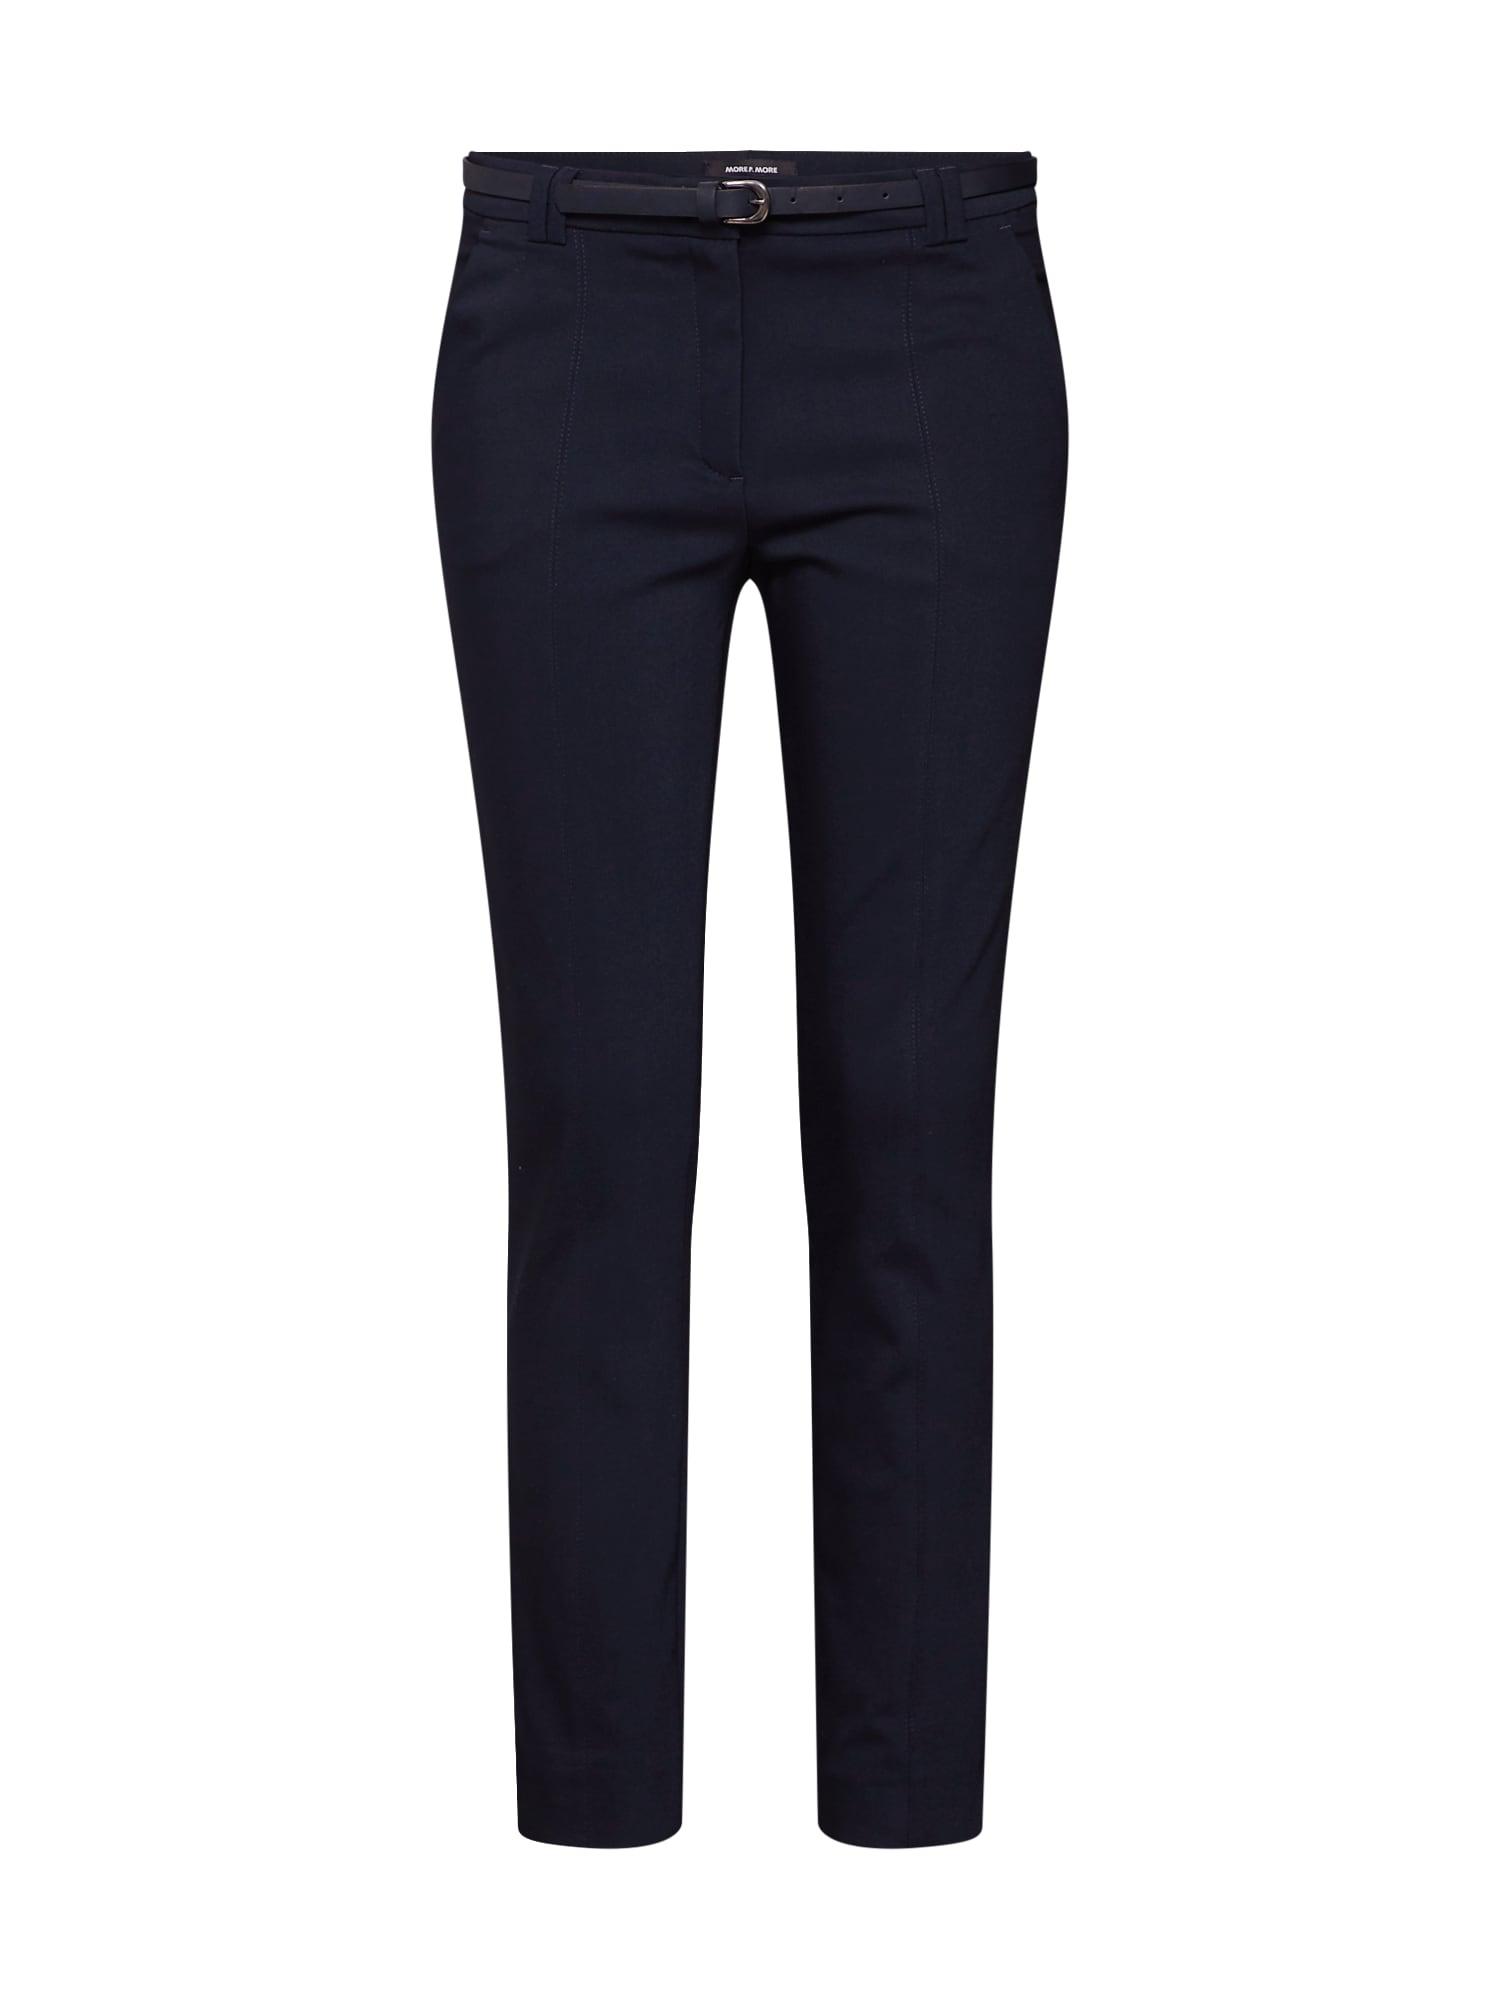 Kalhoty marine modrá MORE & MORE